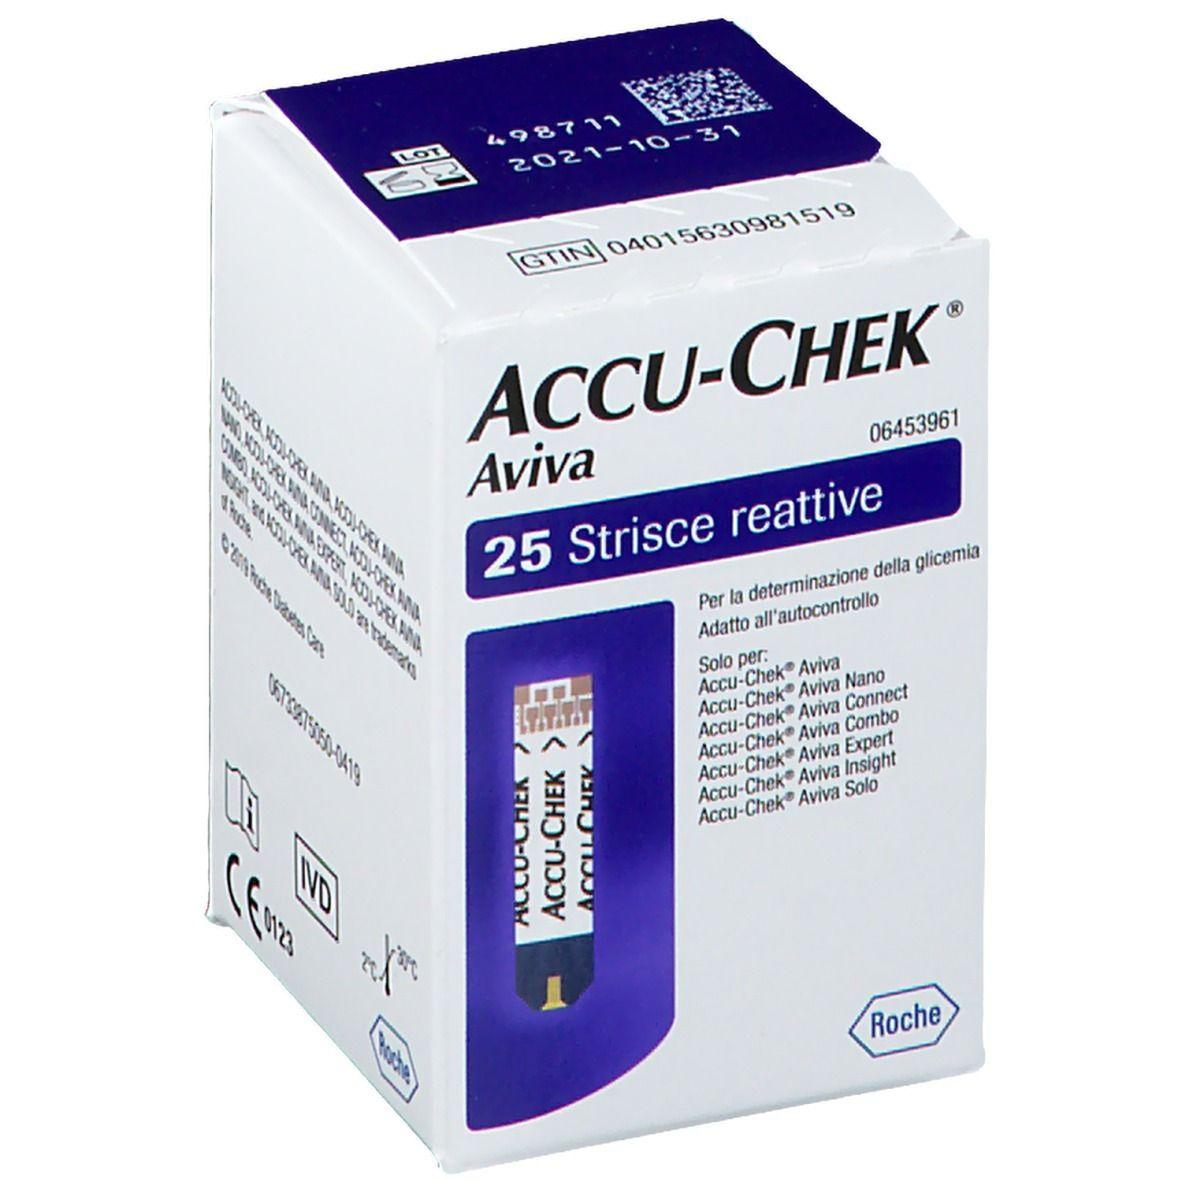 Image of ACCU CHEK Aviva Teststreifen